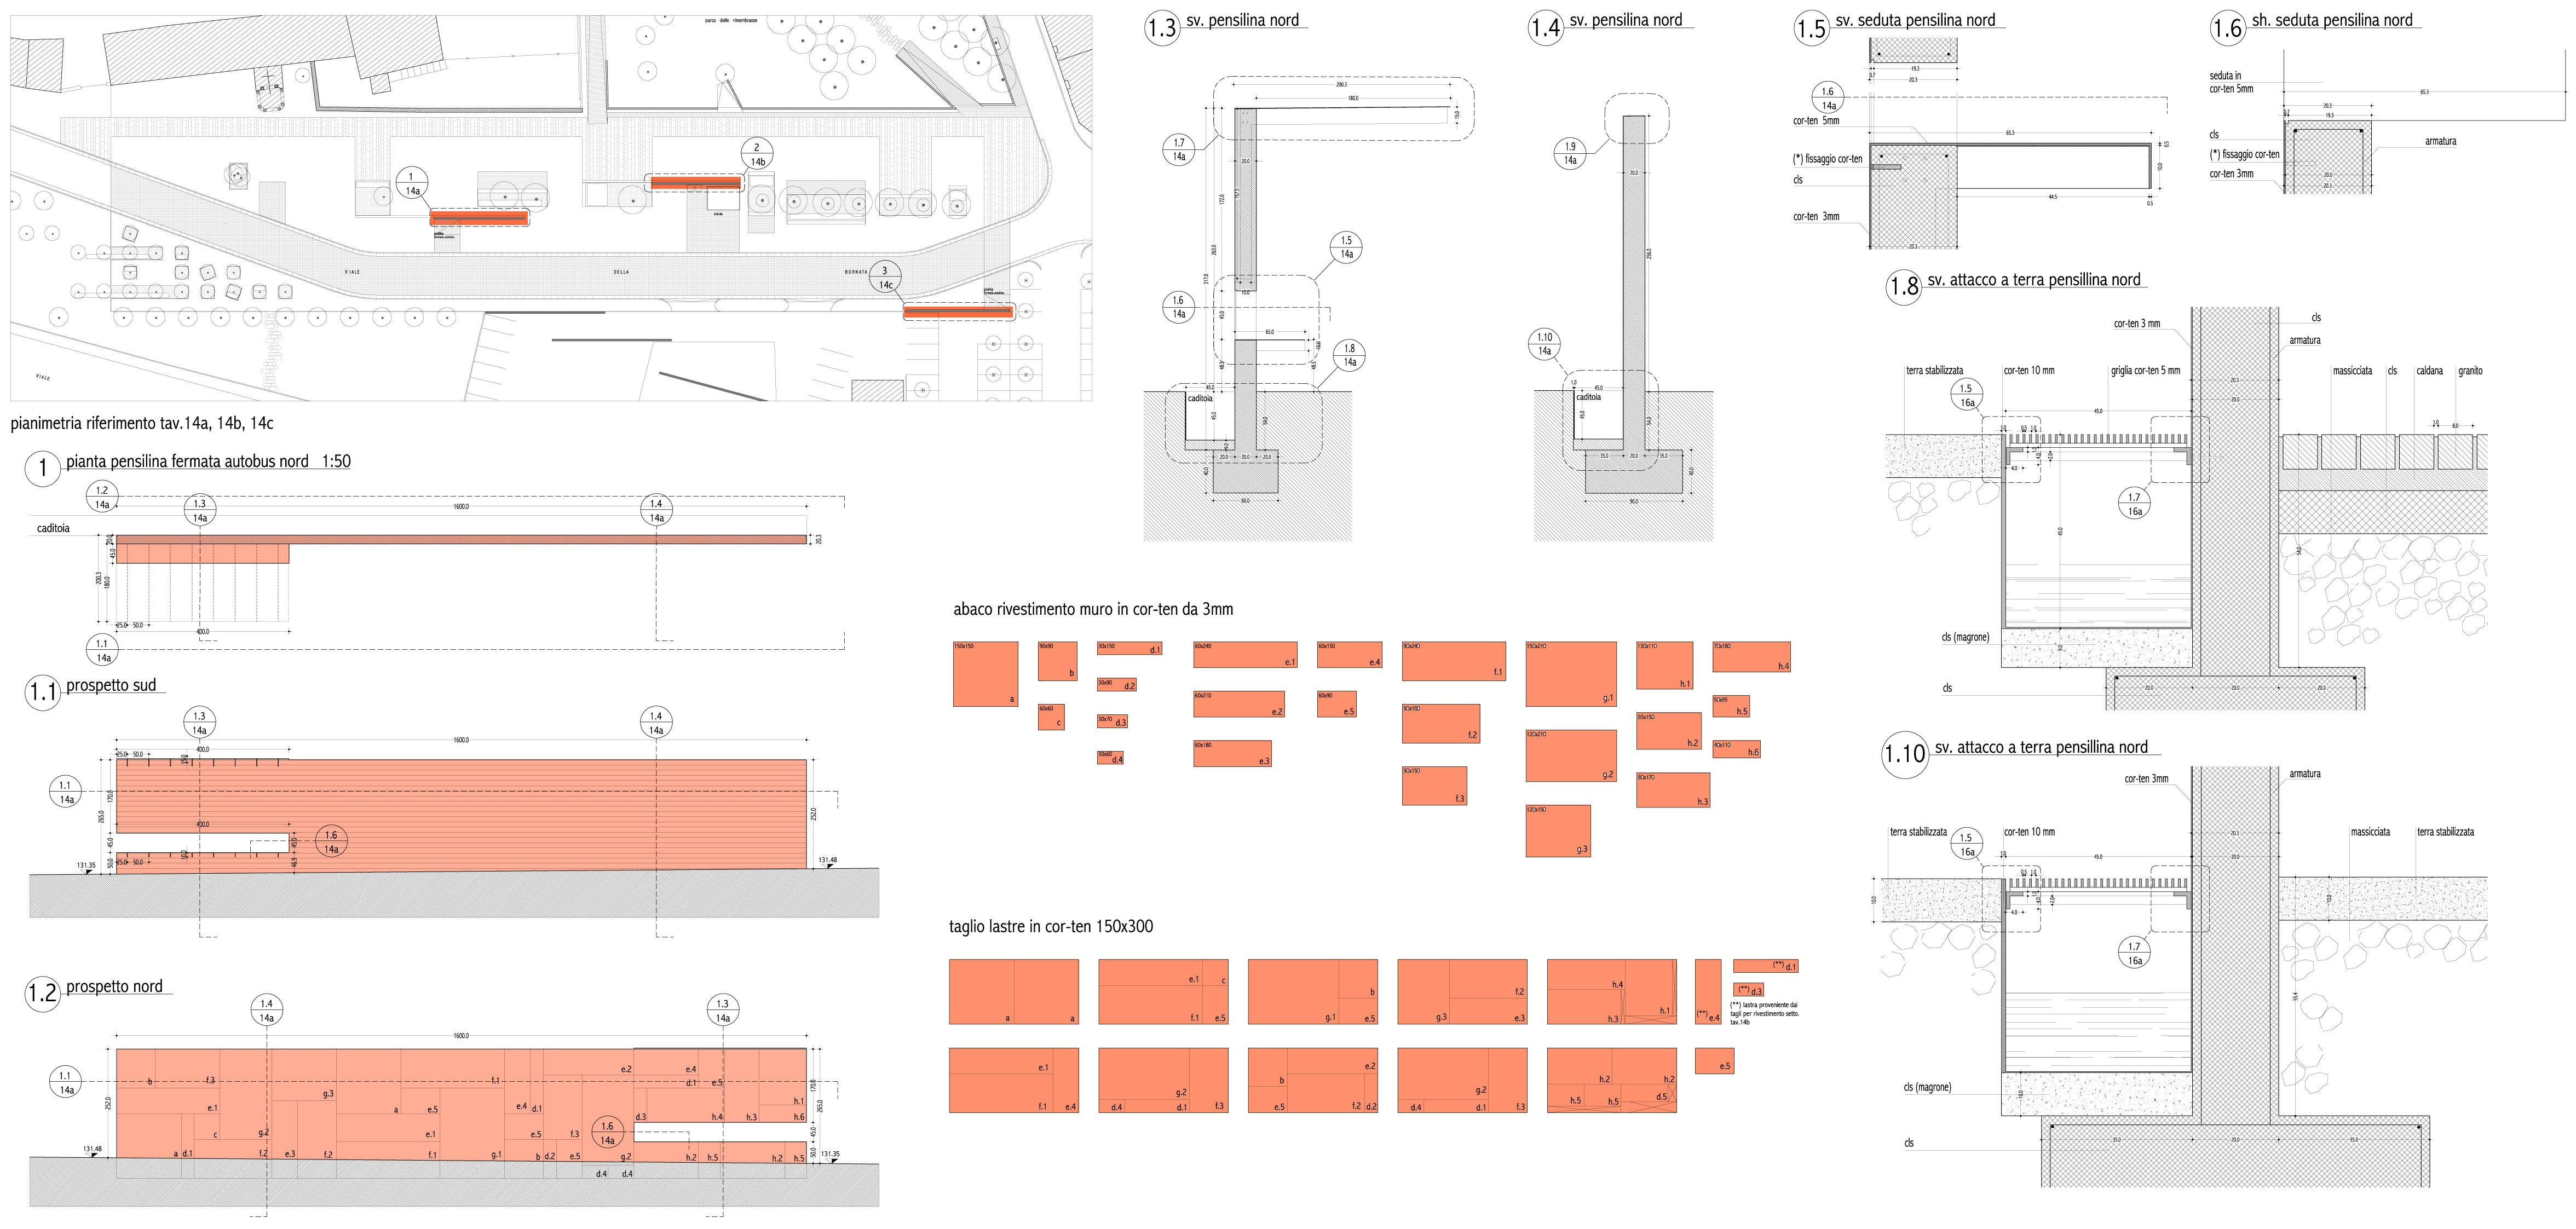 corten wall detail drawing paolo mestriner studioazero. Black Bedroom Furniture Sets. Home Design Ideas